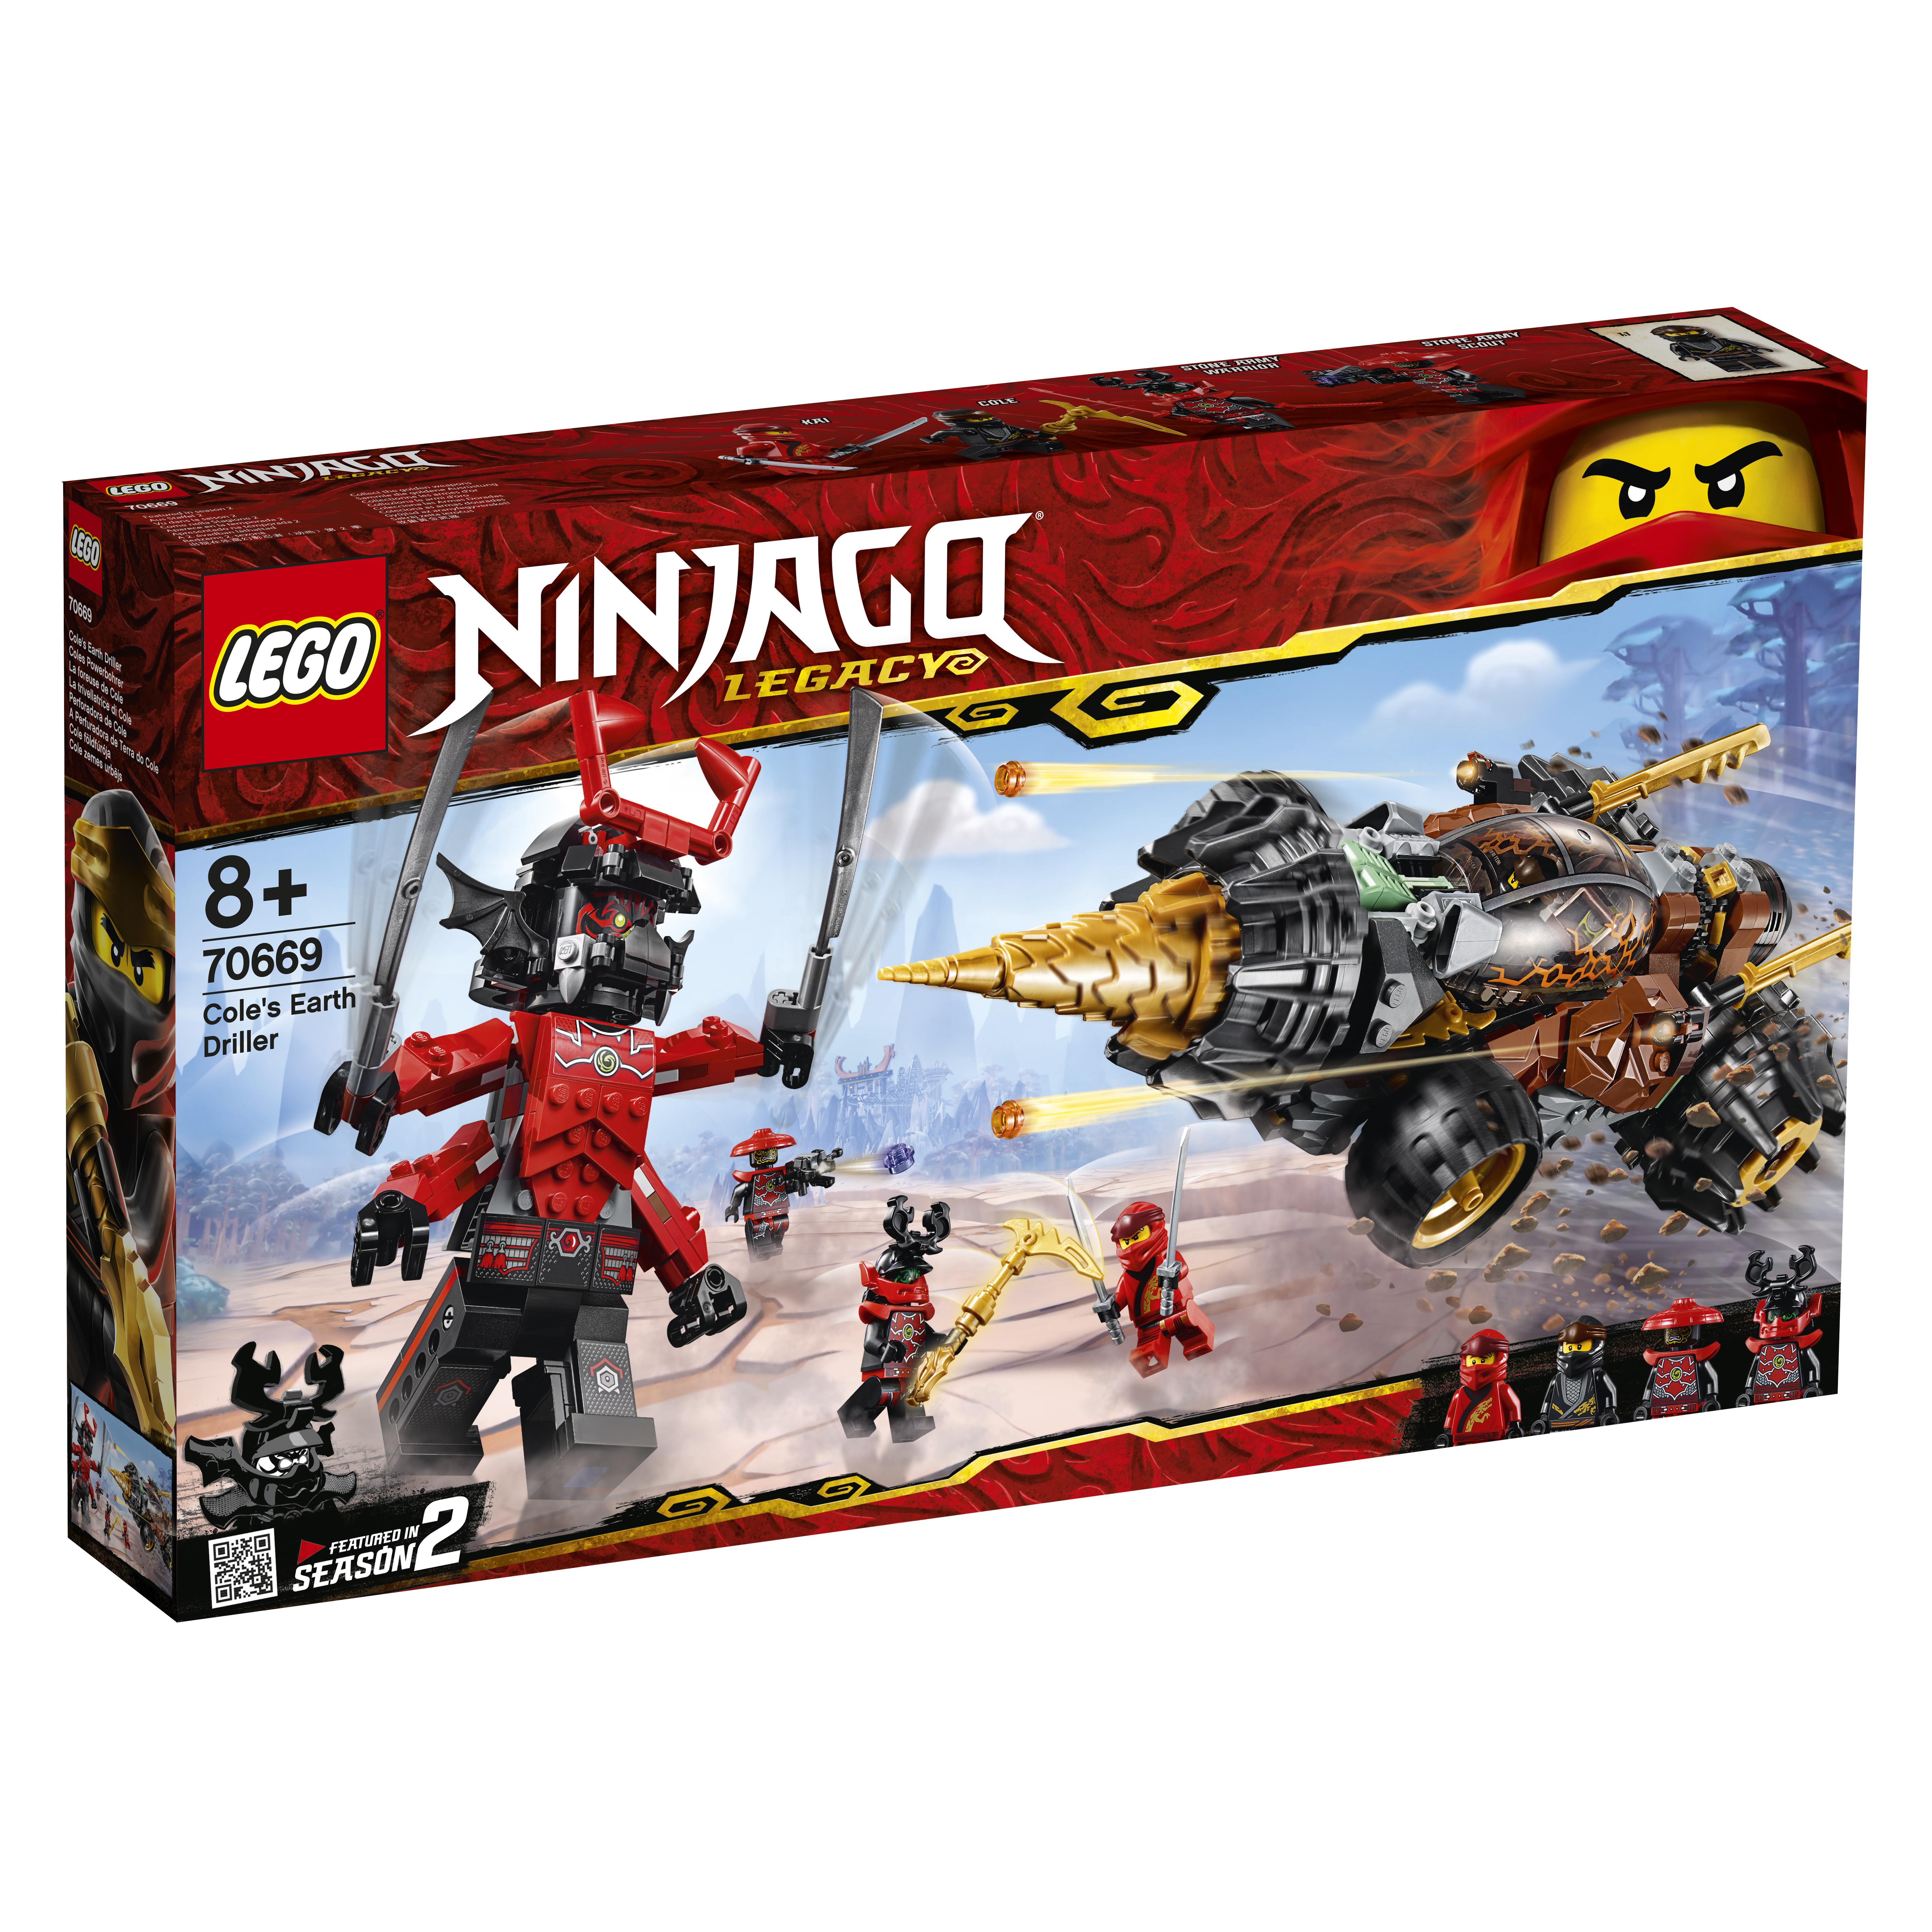 Конструктор LEGO Ninjago 70669 Земляной бур Коула. конструктор lego земляной бур коула 70669 ninjago legacy